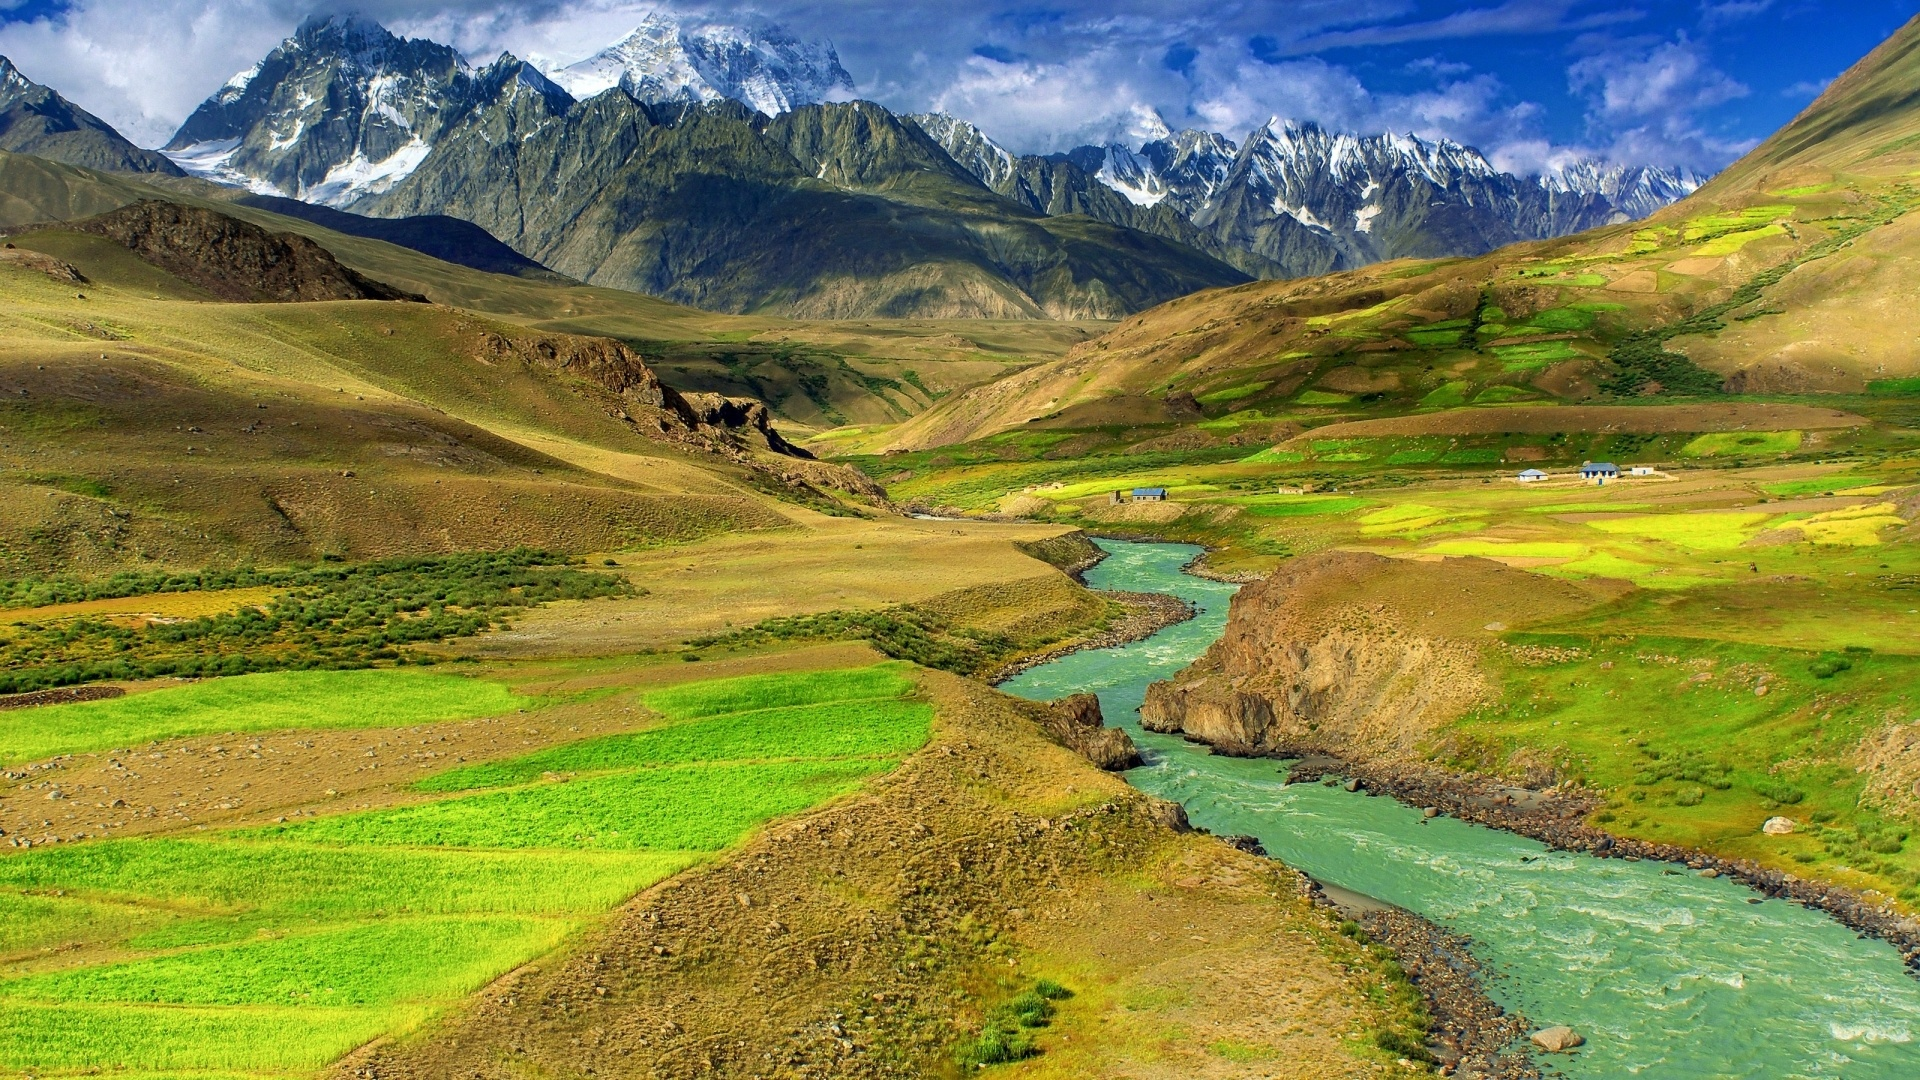 Mongolia Nature cool wallpaper